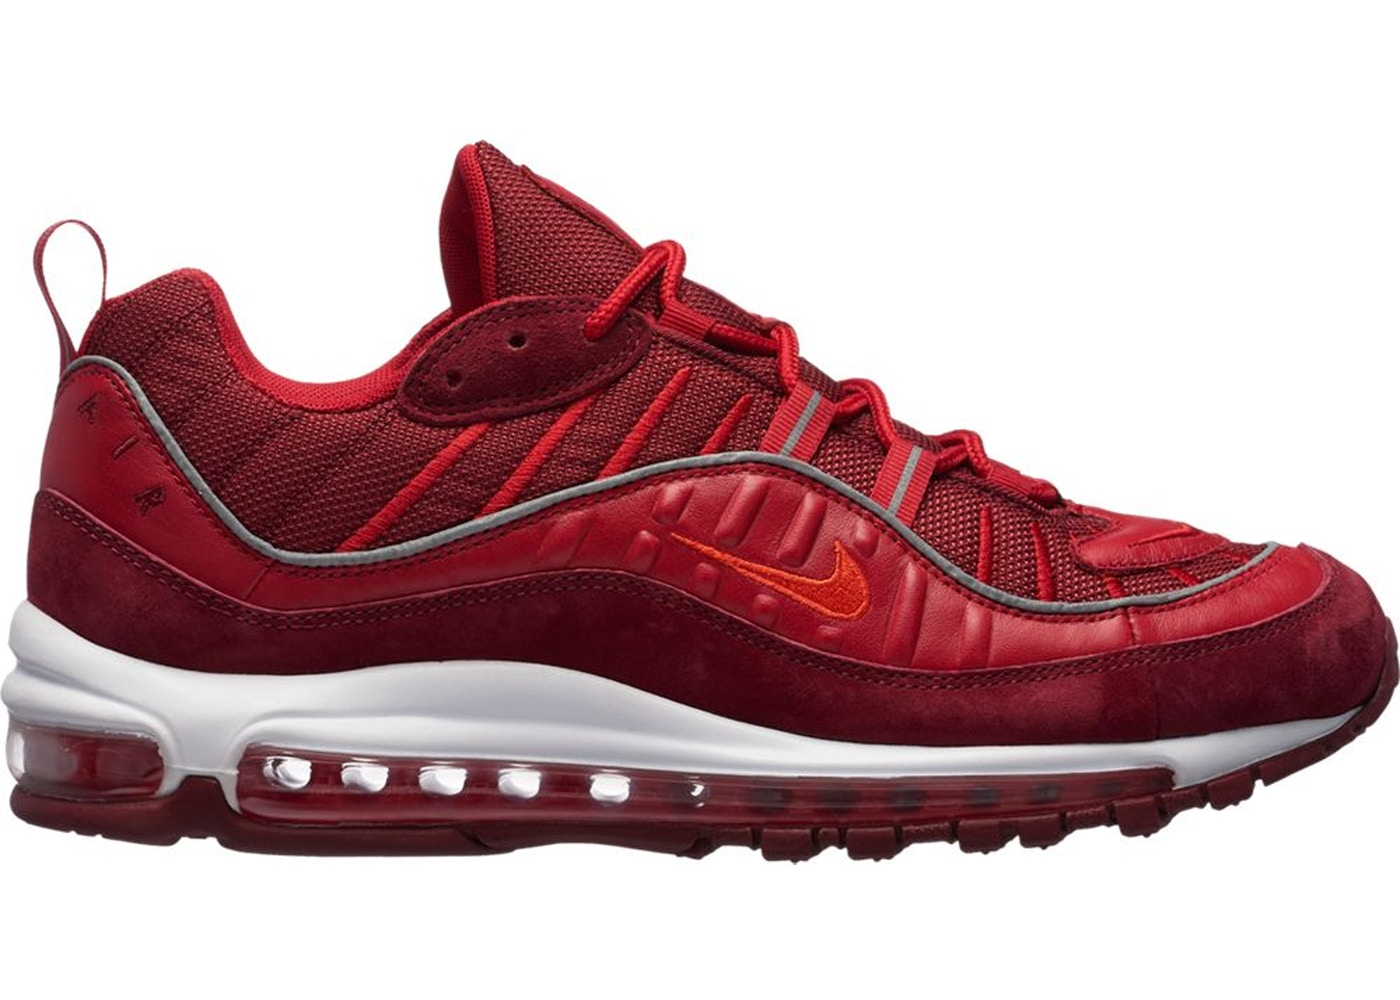 Nike Air Max 98 Triple Red